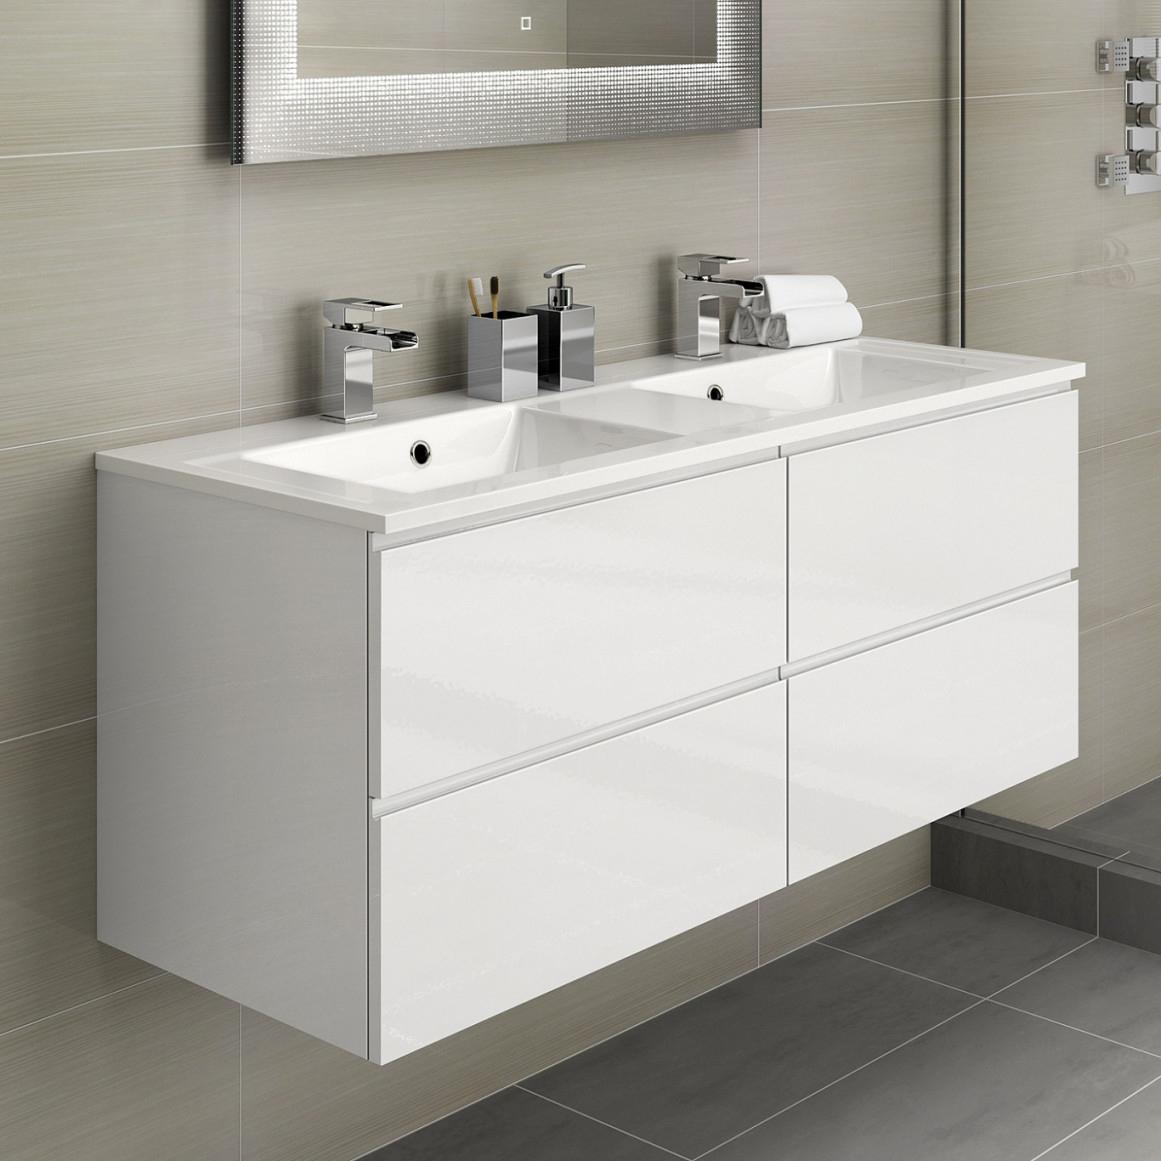 Wickes Ed Bathroom Furniture